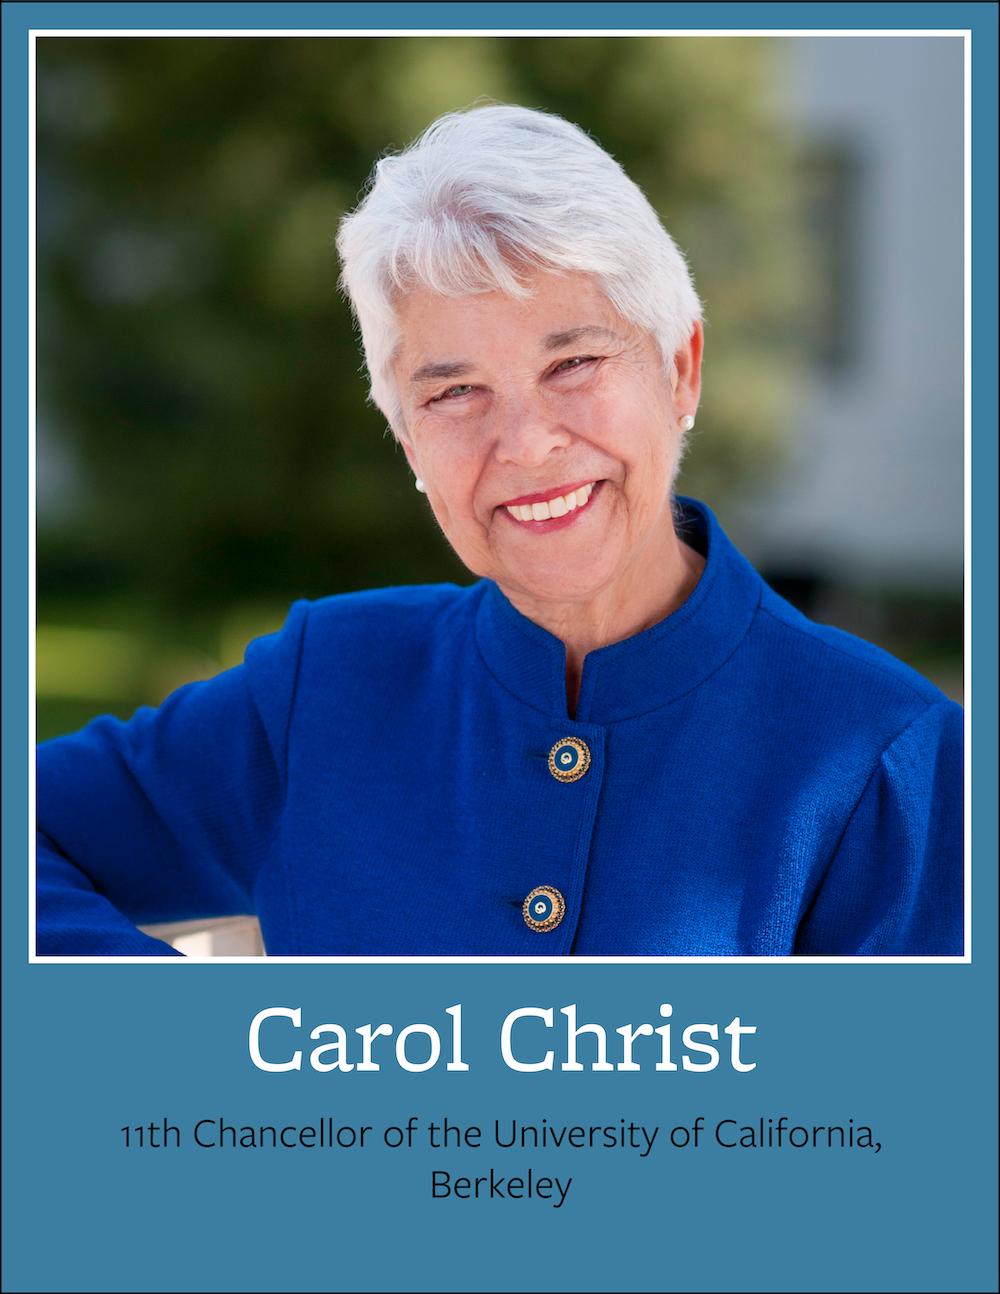 Carol Christ, 11th Chancellor of the University of California, Berkeley